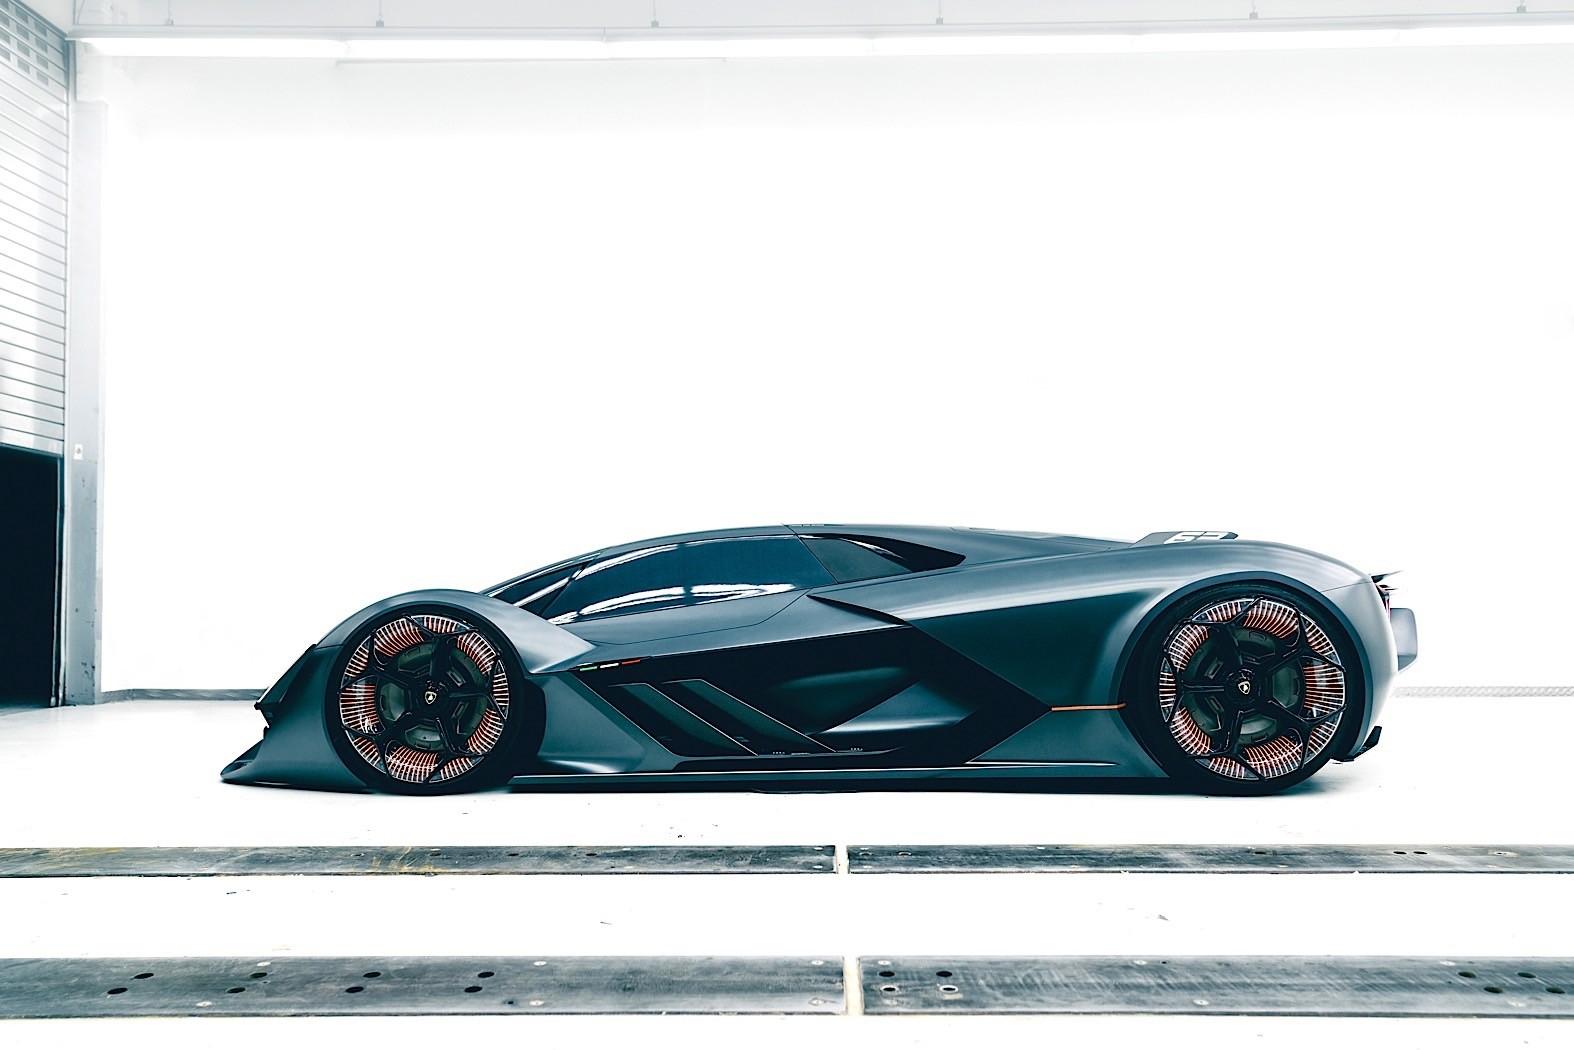 Lamborghini Hybrid Supercar Reportedly Shown To Prospective